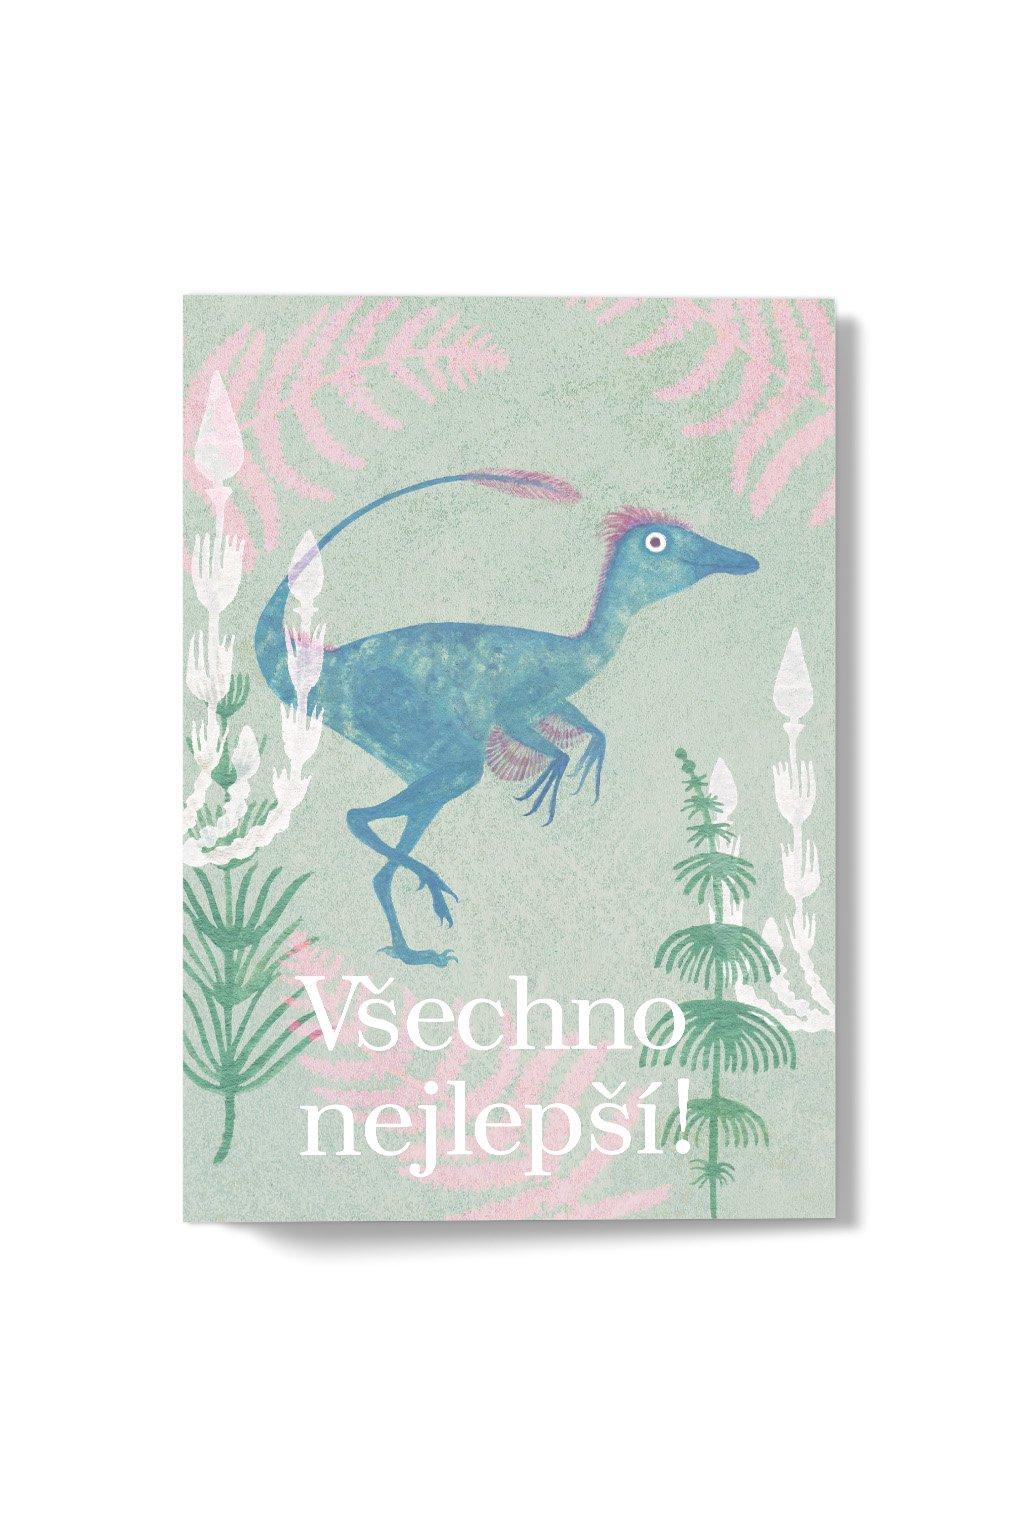 JAATY_ilustrovane-pranicko-k-narozeninam-dinosauri